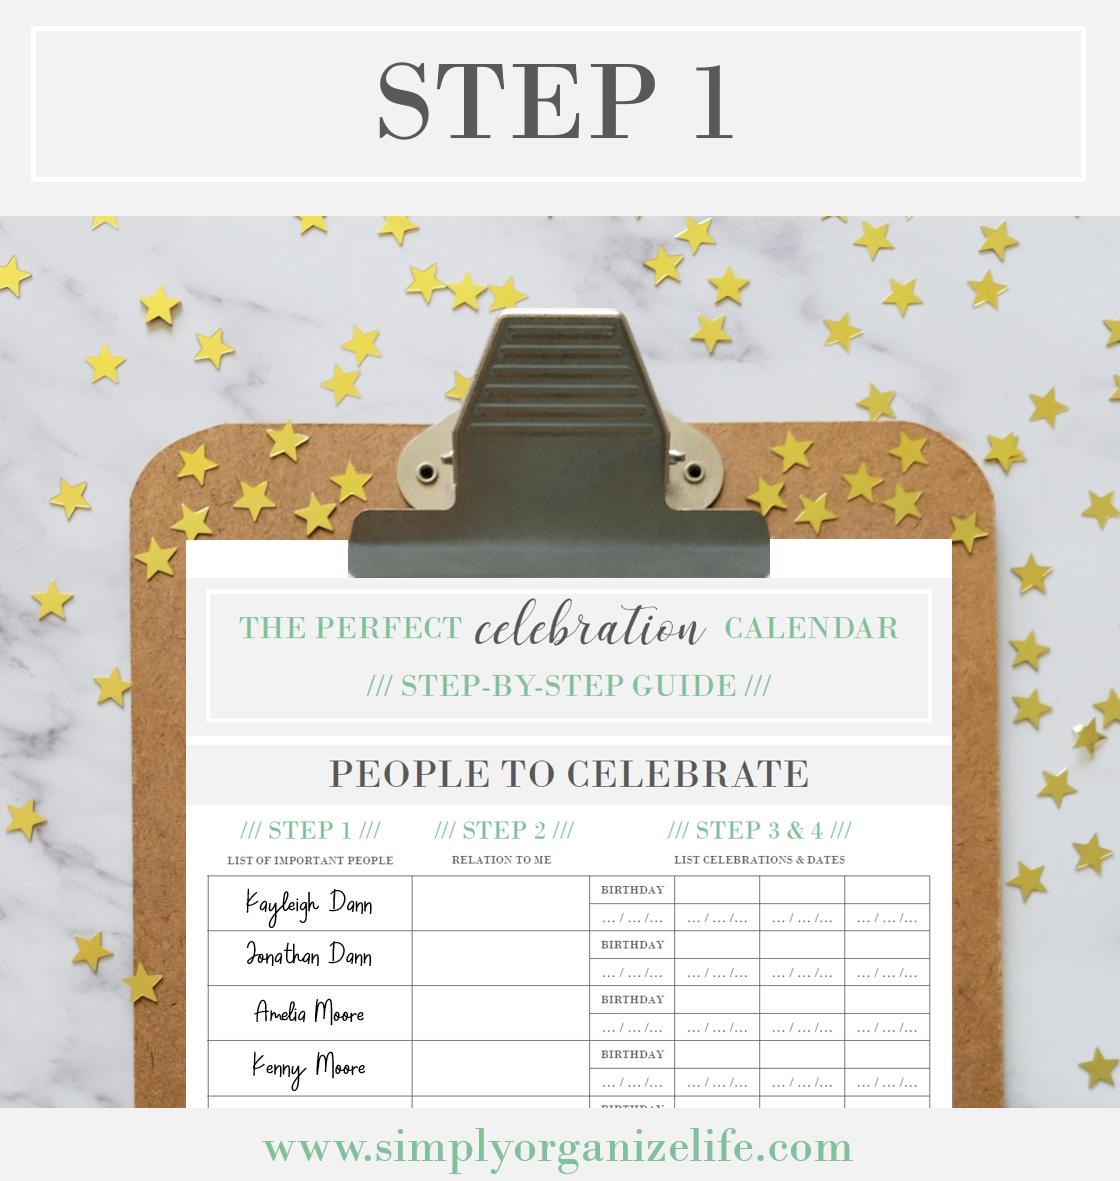 SIMPLY-ORGANIZE-LIFE-PERFECT-CELEBRATION-BIRTHDAY-CALENDAR-FREE-PRINTABLE-STEP-1